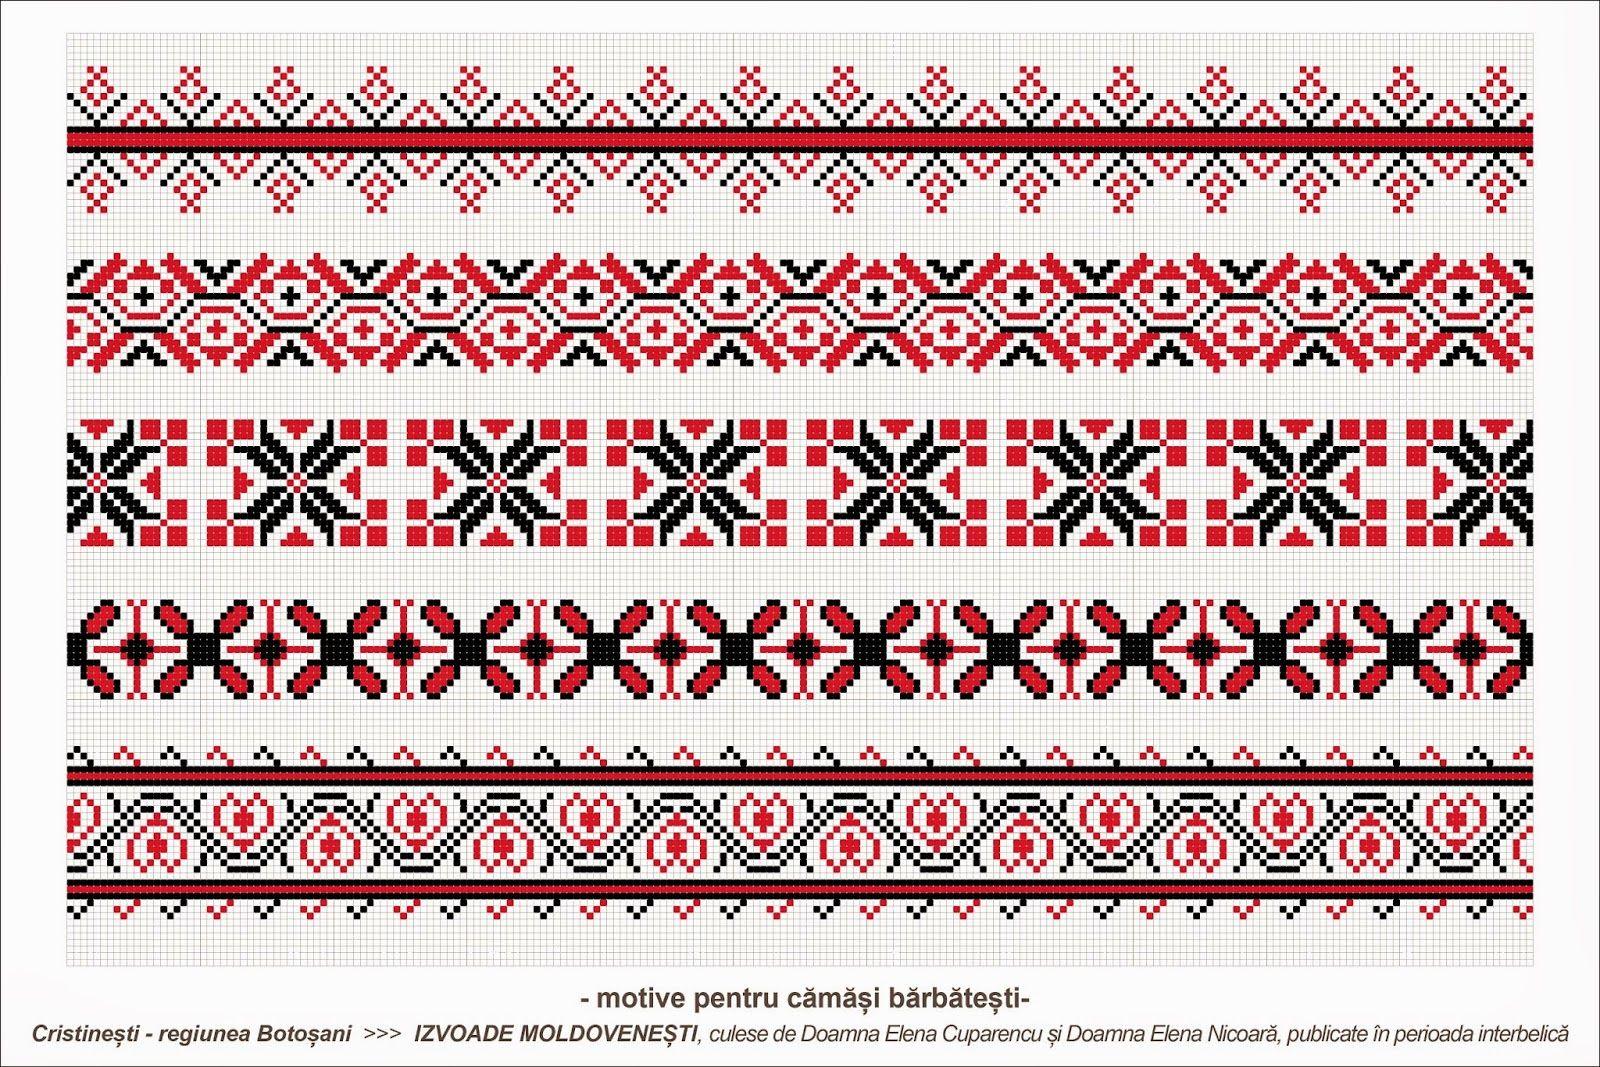 Semne cusute romanian traditional motifs moldova botosani cristinesti semne populare - Beautiful romanian folk motifs ...